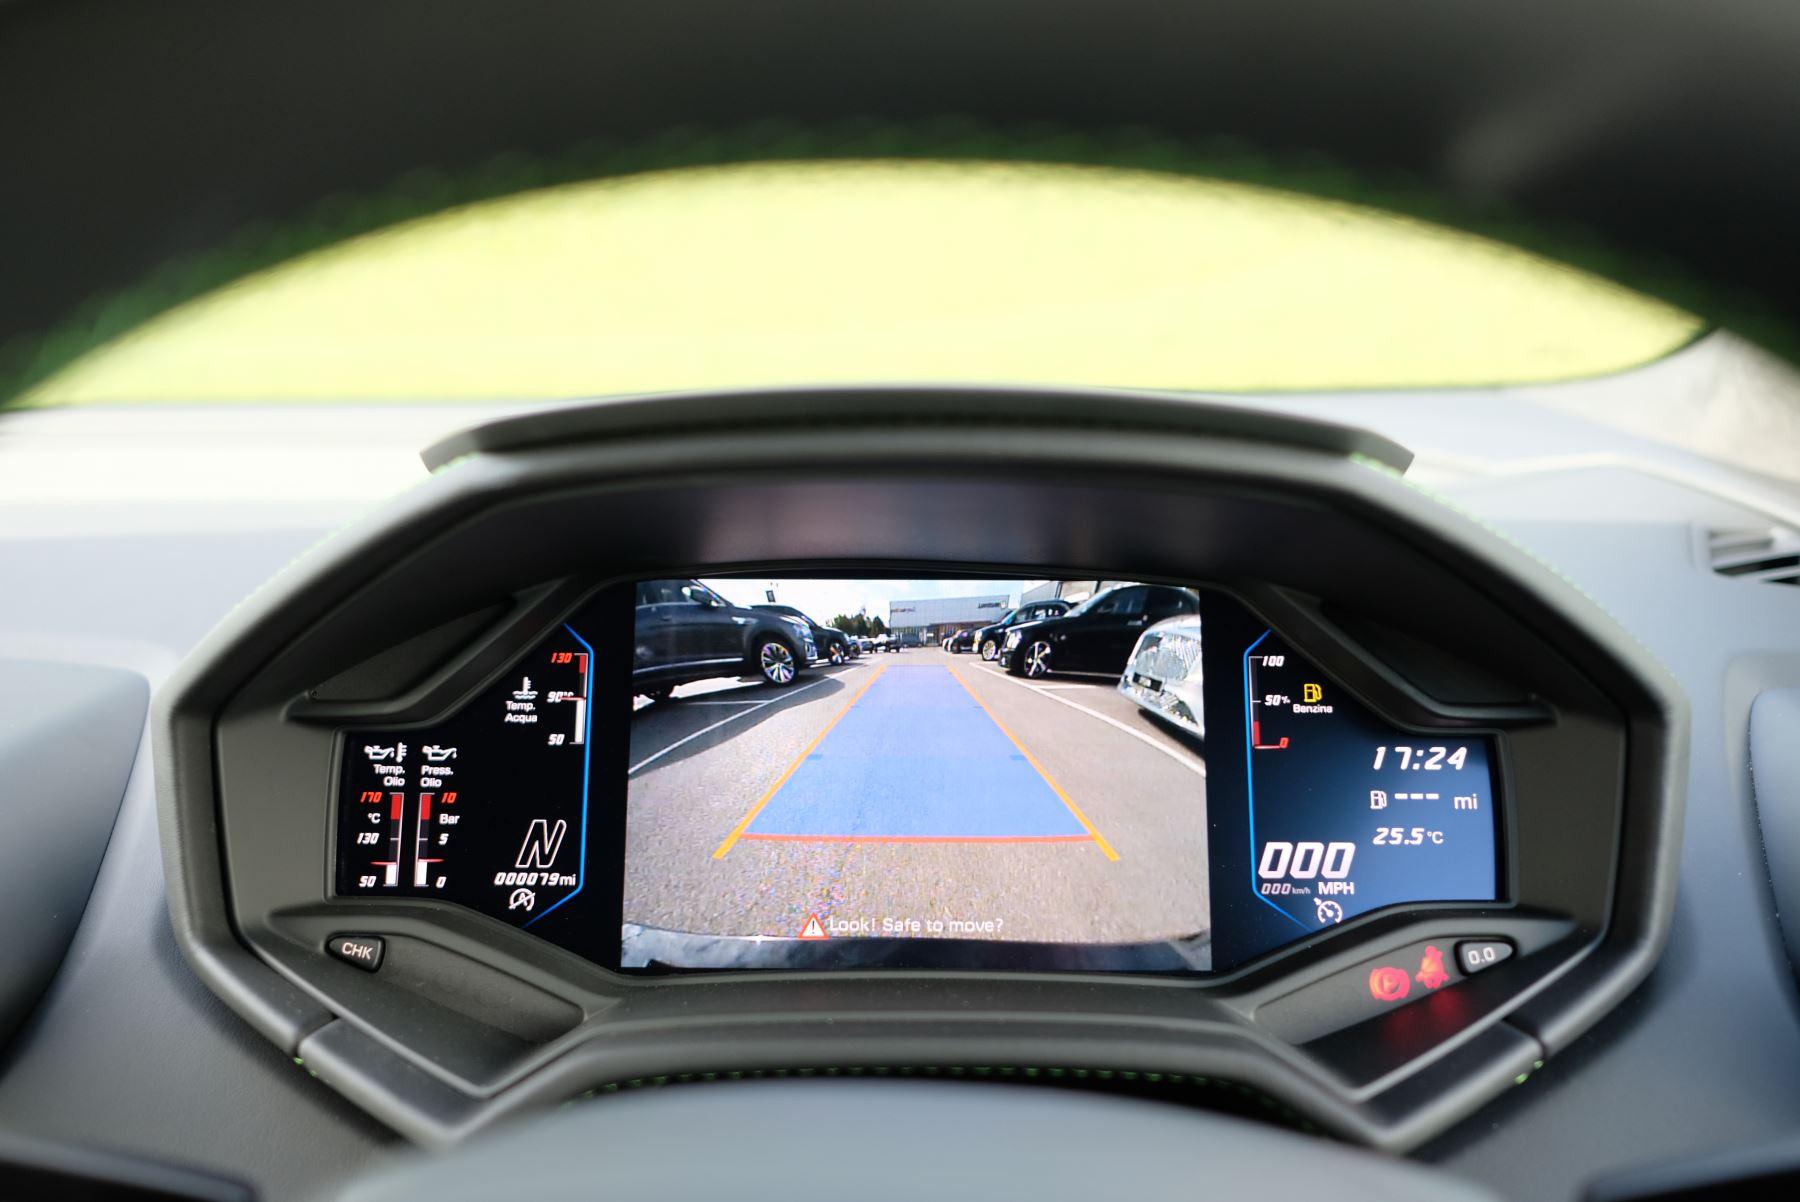 Lamborghini Huracan EVO 5.2 V10 640 2dr Auto AWD image 15